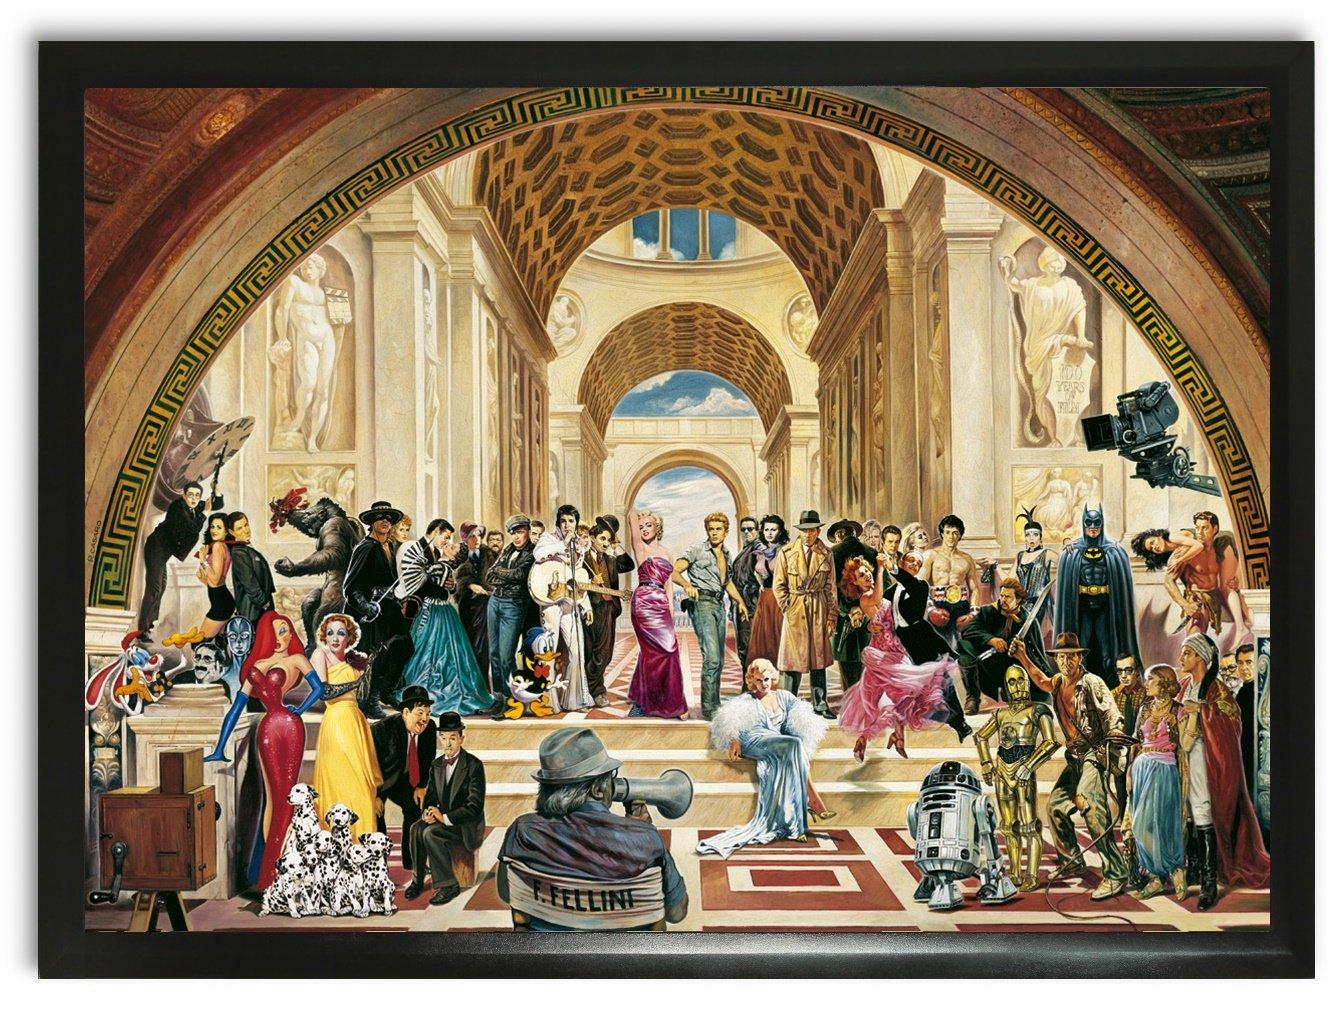 Bild Kunstdruck Renato Casaro 100 years of film Hollywood James Dean Elvis Presley star wars xxl